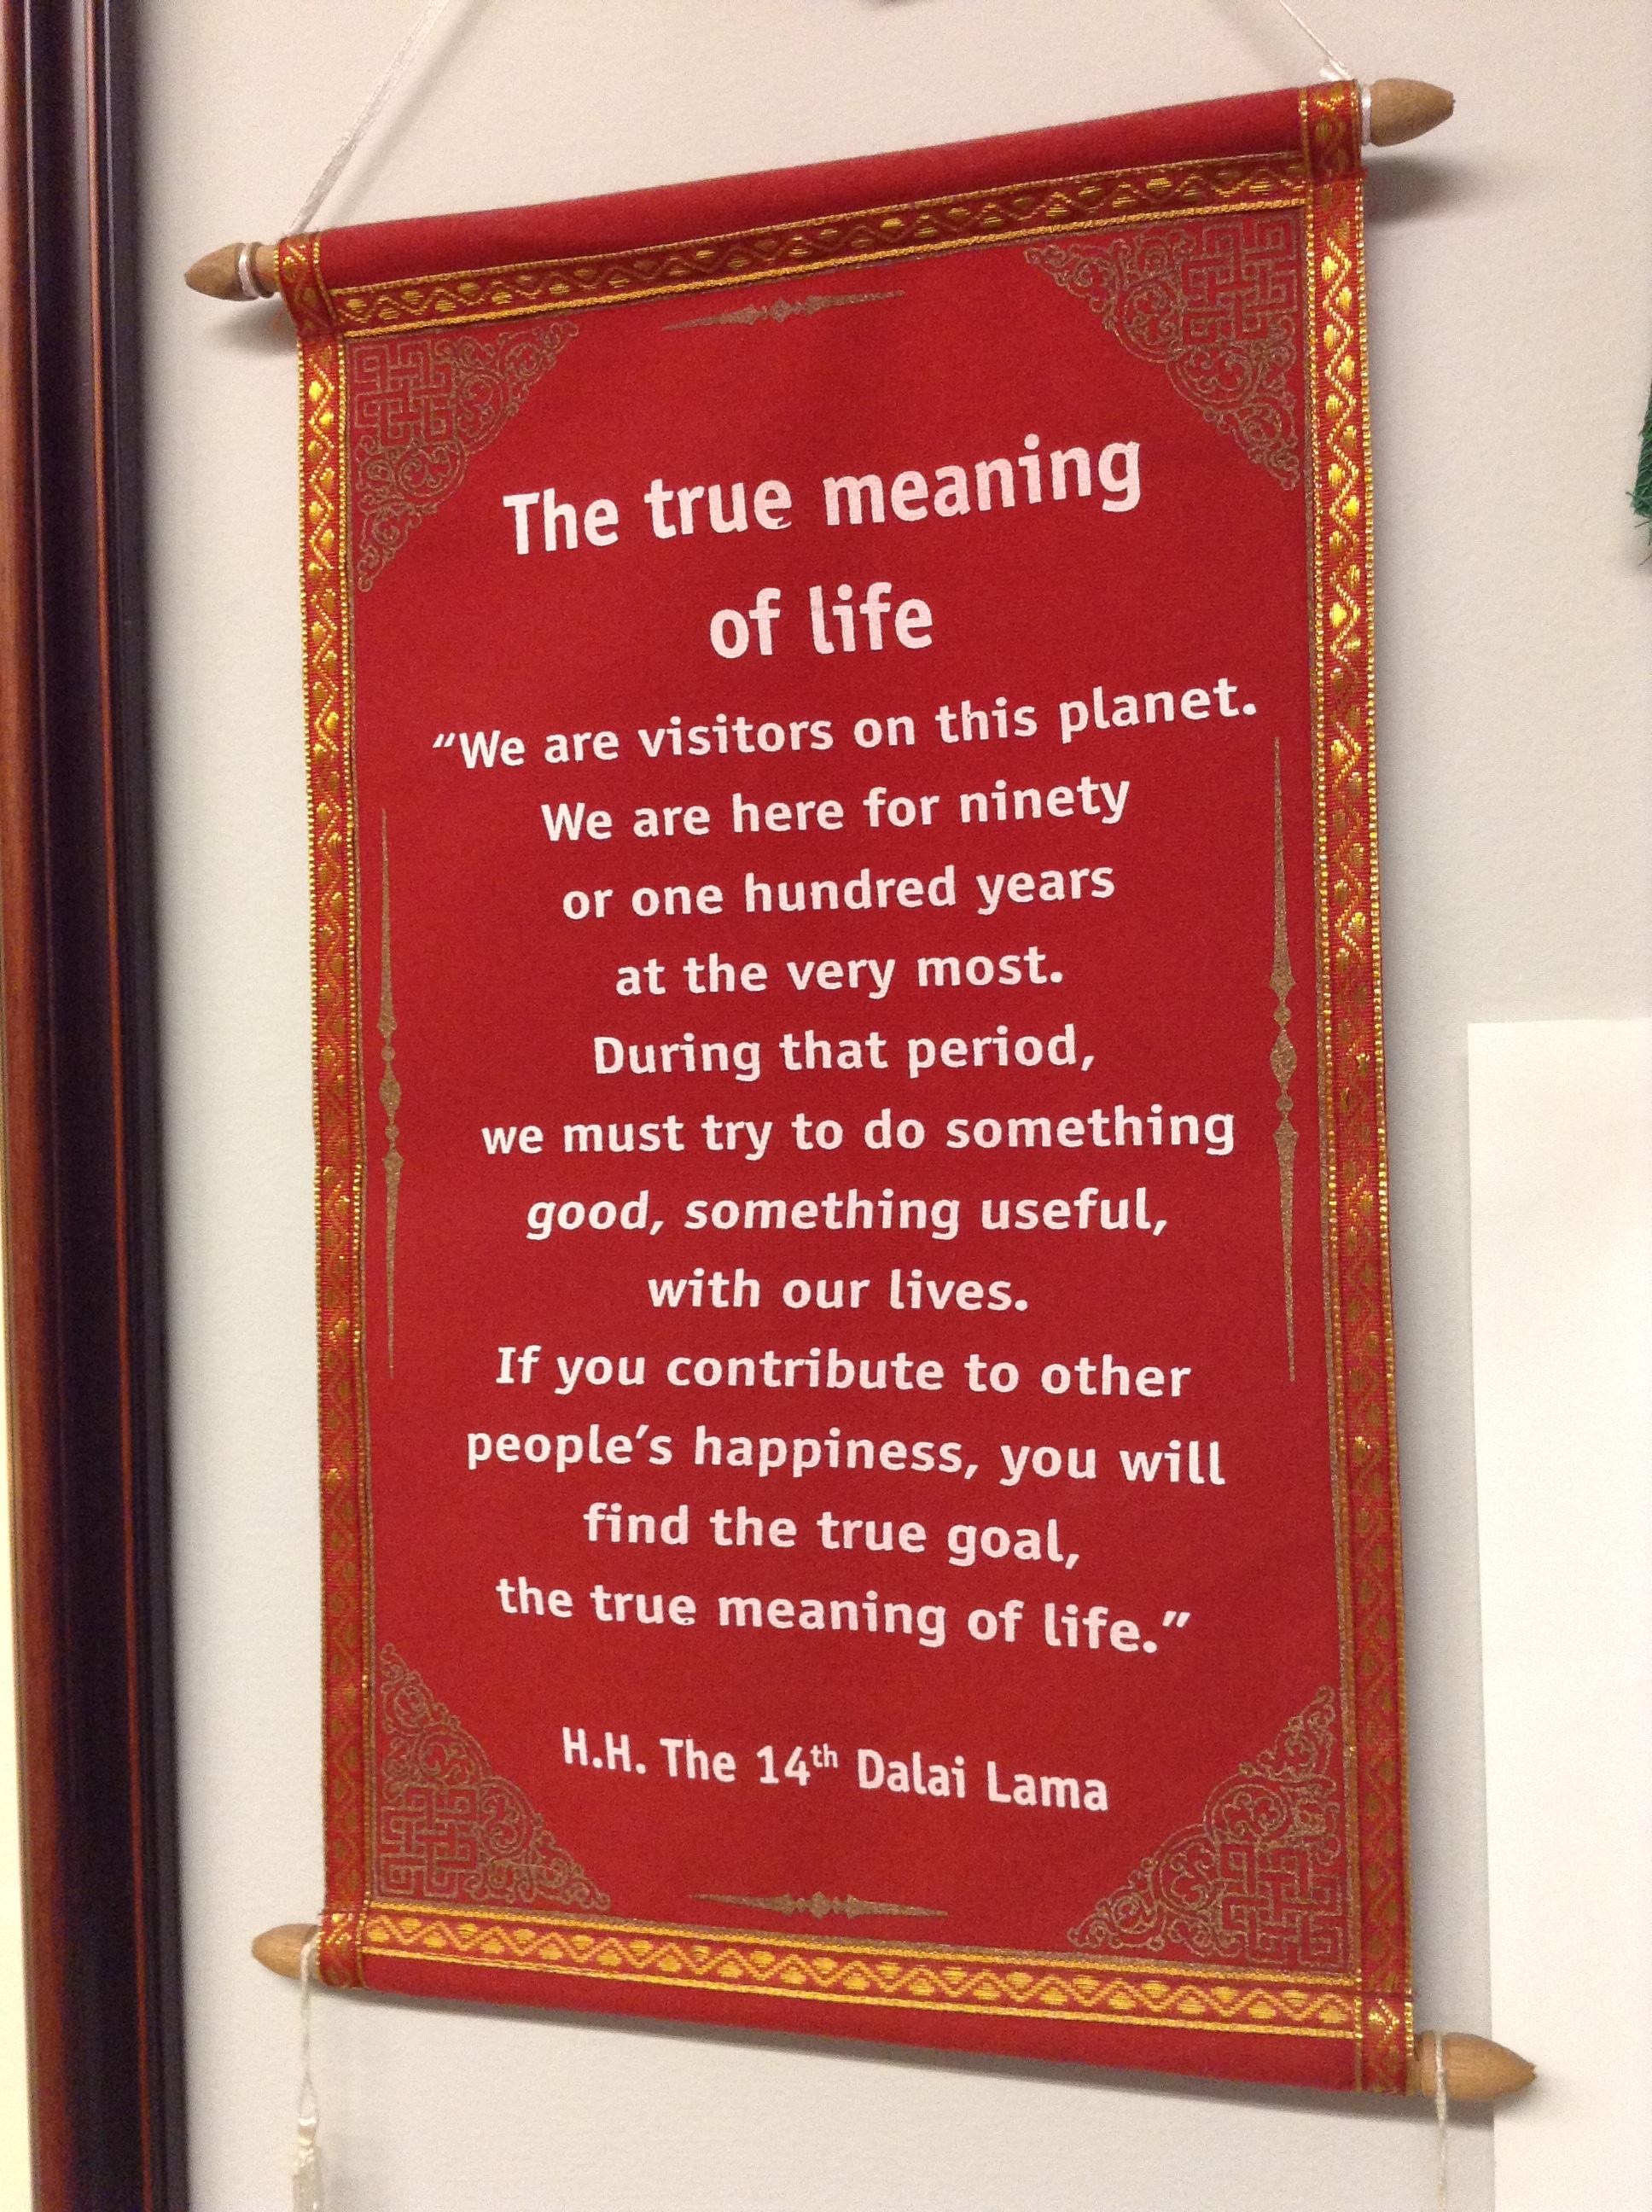 HH Dalai Lama quote